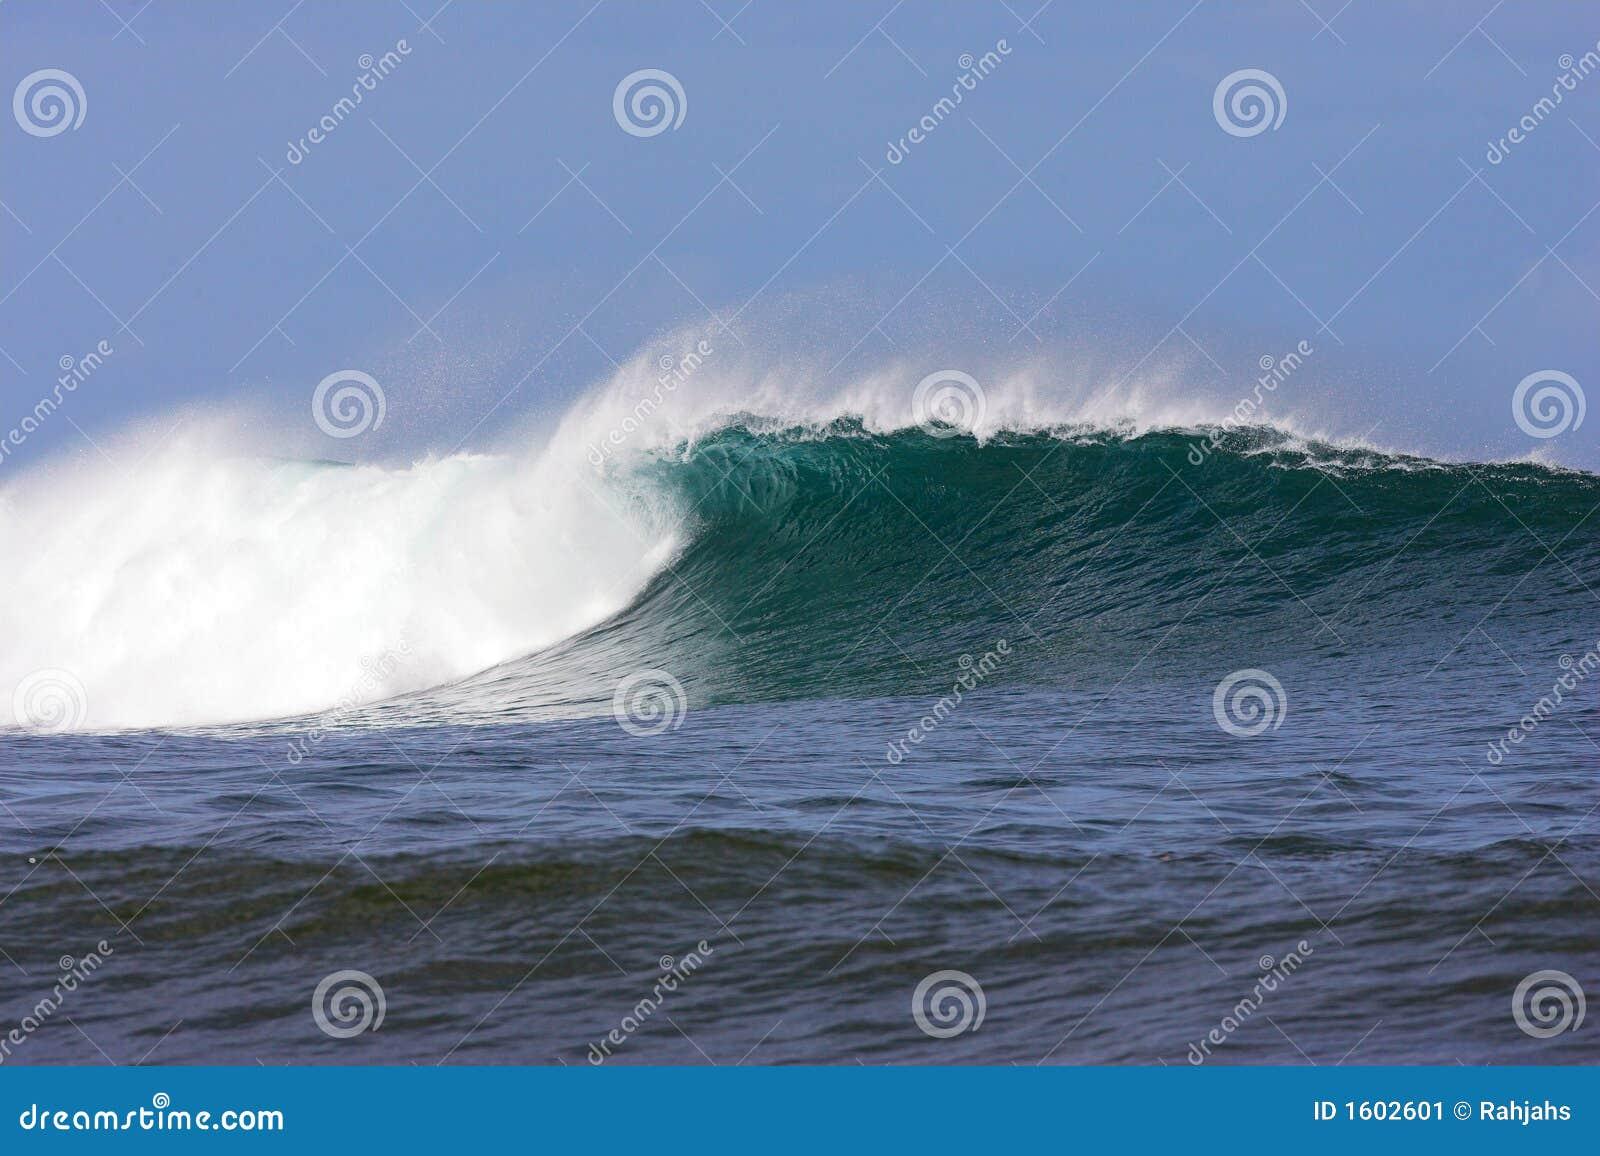 stock image of hawaiian - photo #7